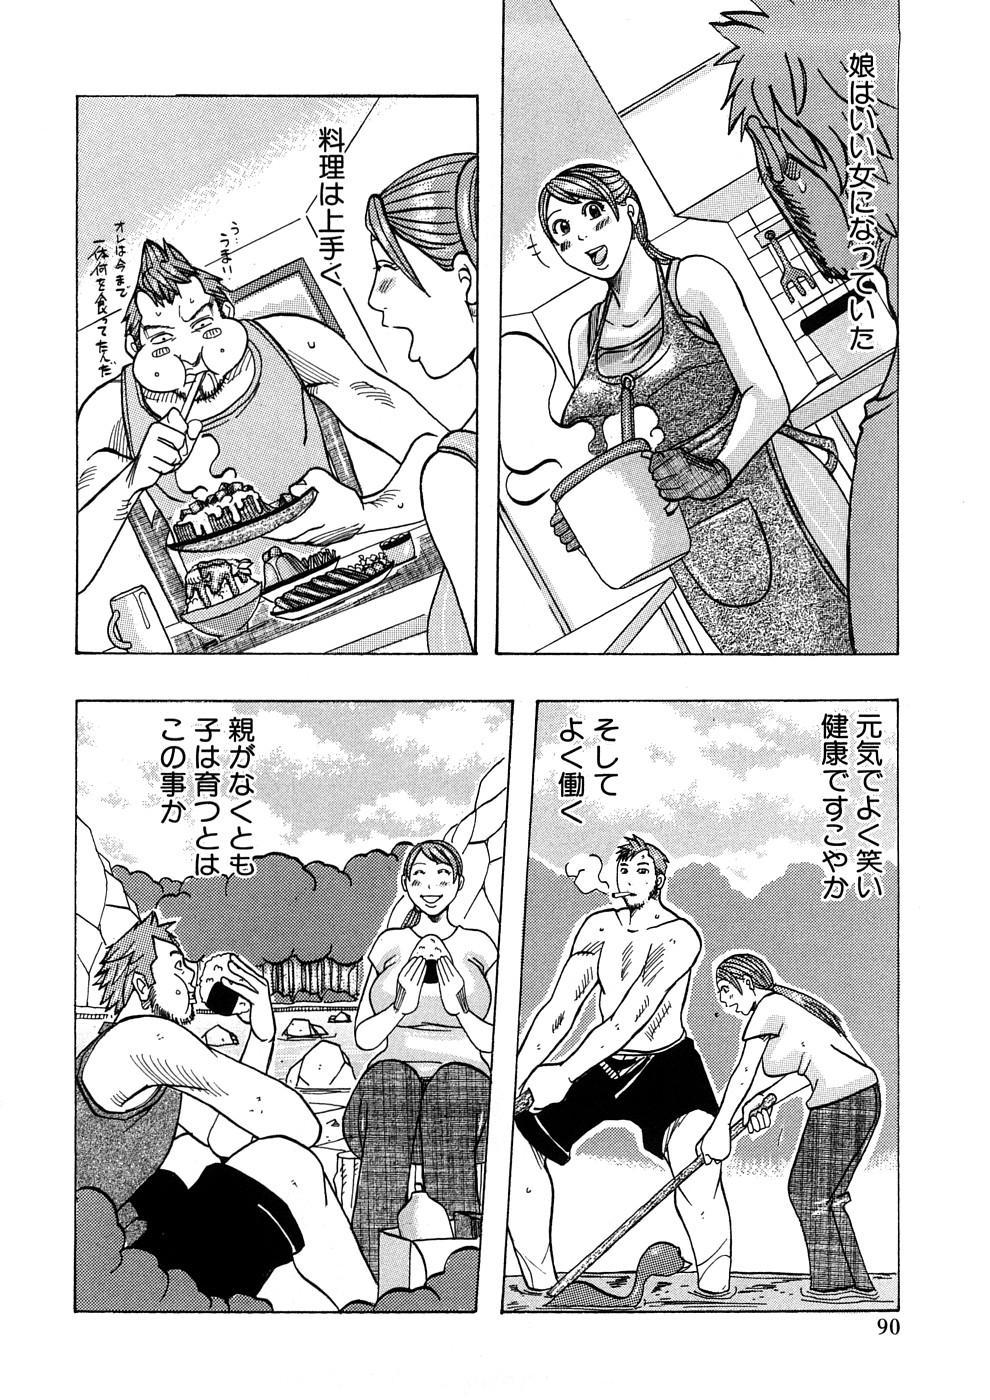 Geki Yaba Anthology Vol. 1 - Naka ni Dashite yo 90